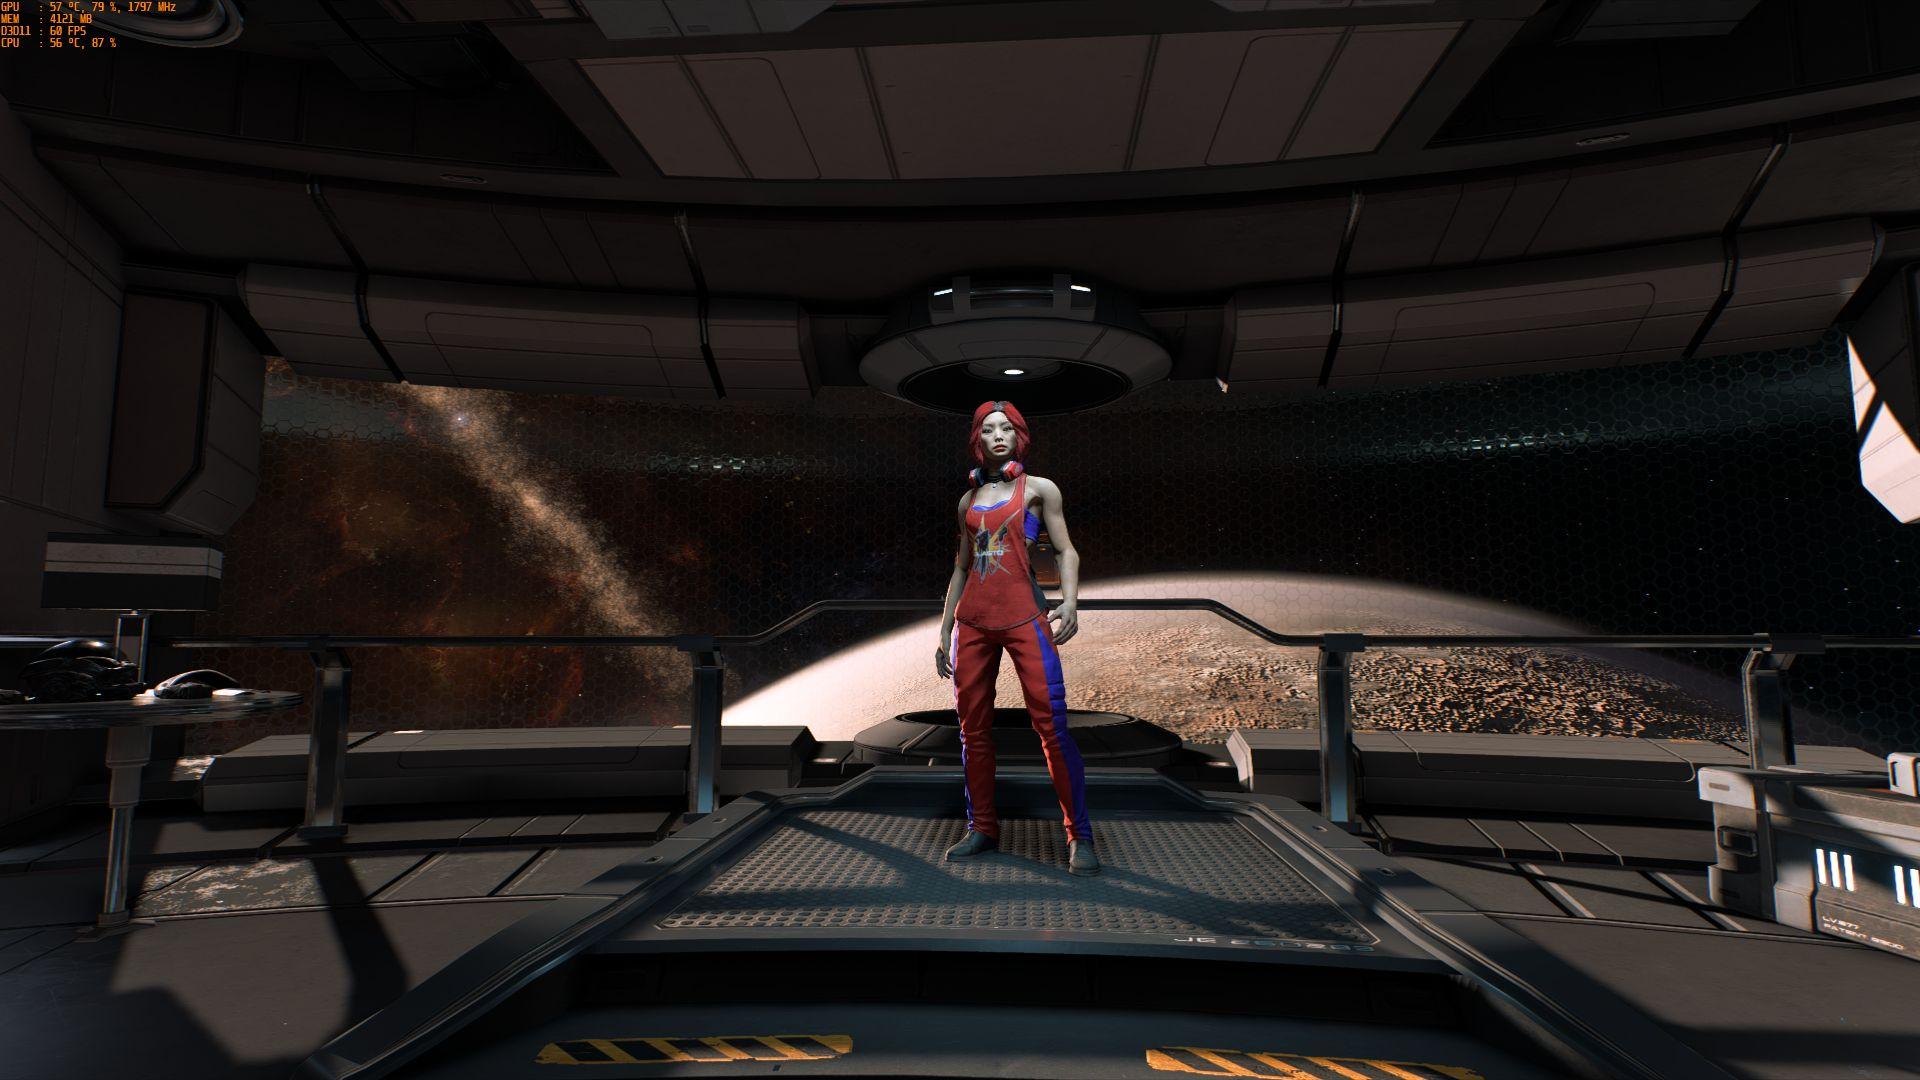 Mass Effect Andromeda Screenshot 2017.07.23 - 13.46.41.92.jpg - Mass Effect: Andromeda